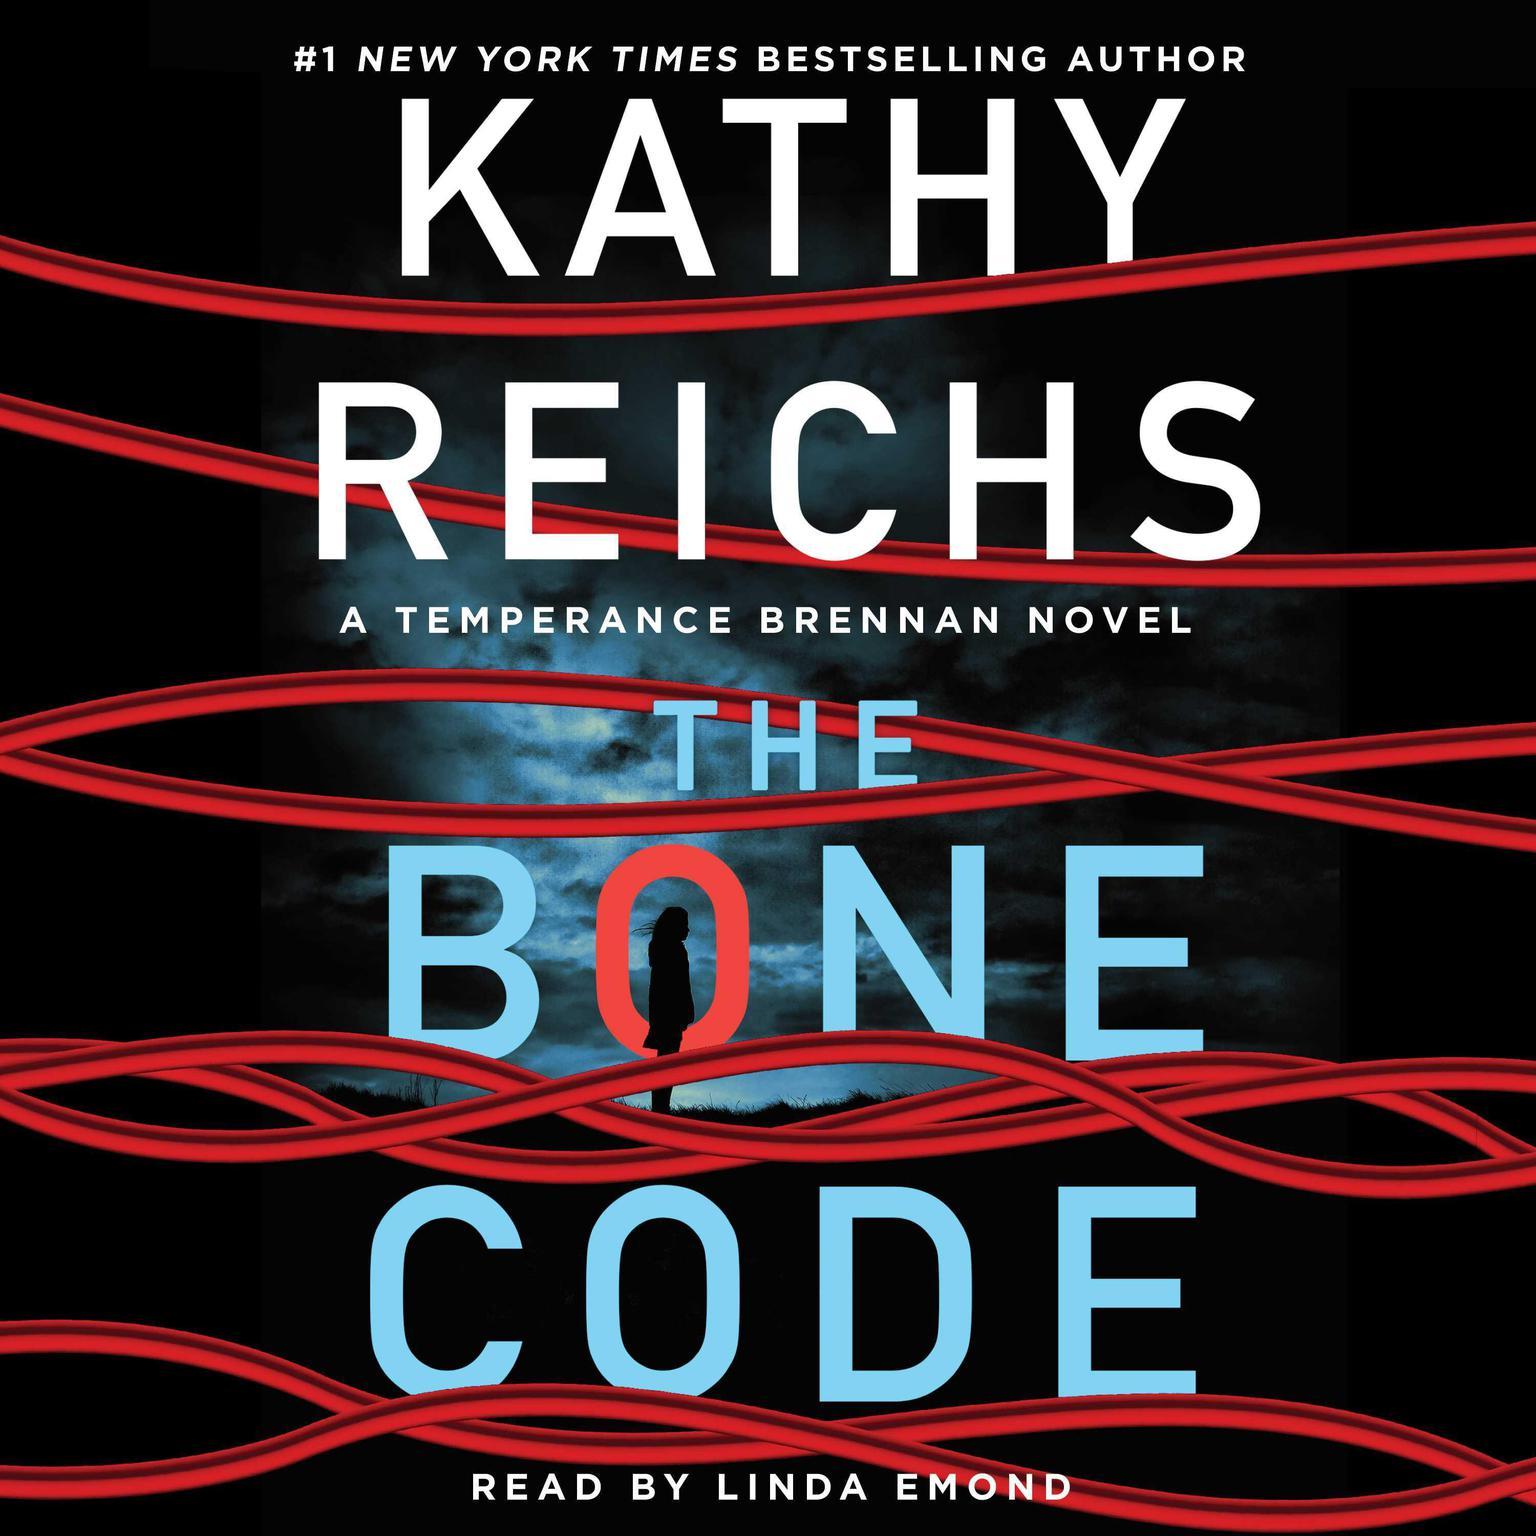 The Bone Code: A Temperance Brennan Novel Audiobook, by Kathy Reichs